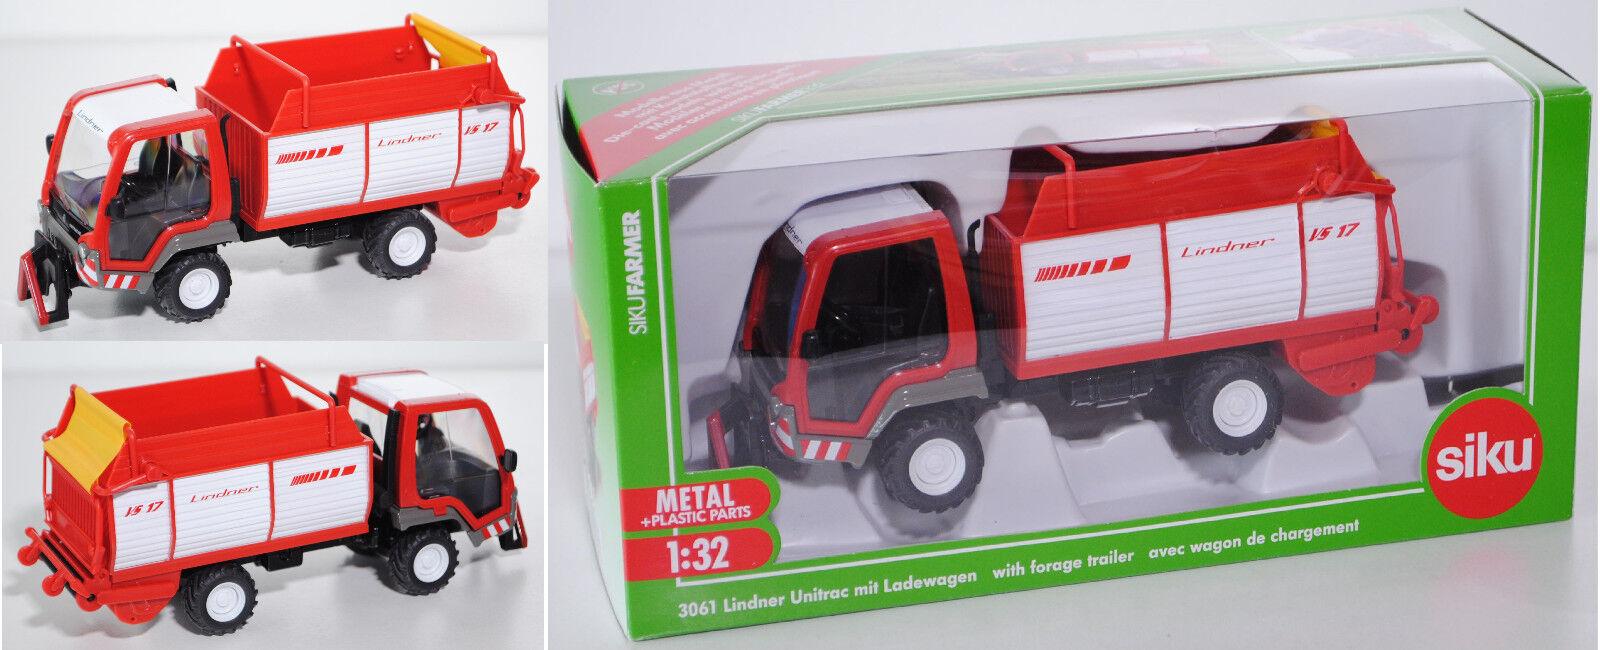 Siku Farmer 3061 Lindner Unitrac 82 (Typ Agrar, Serie 2) mit Ladewagen, 1 32 OVP